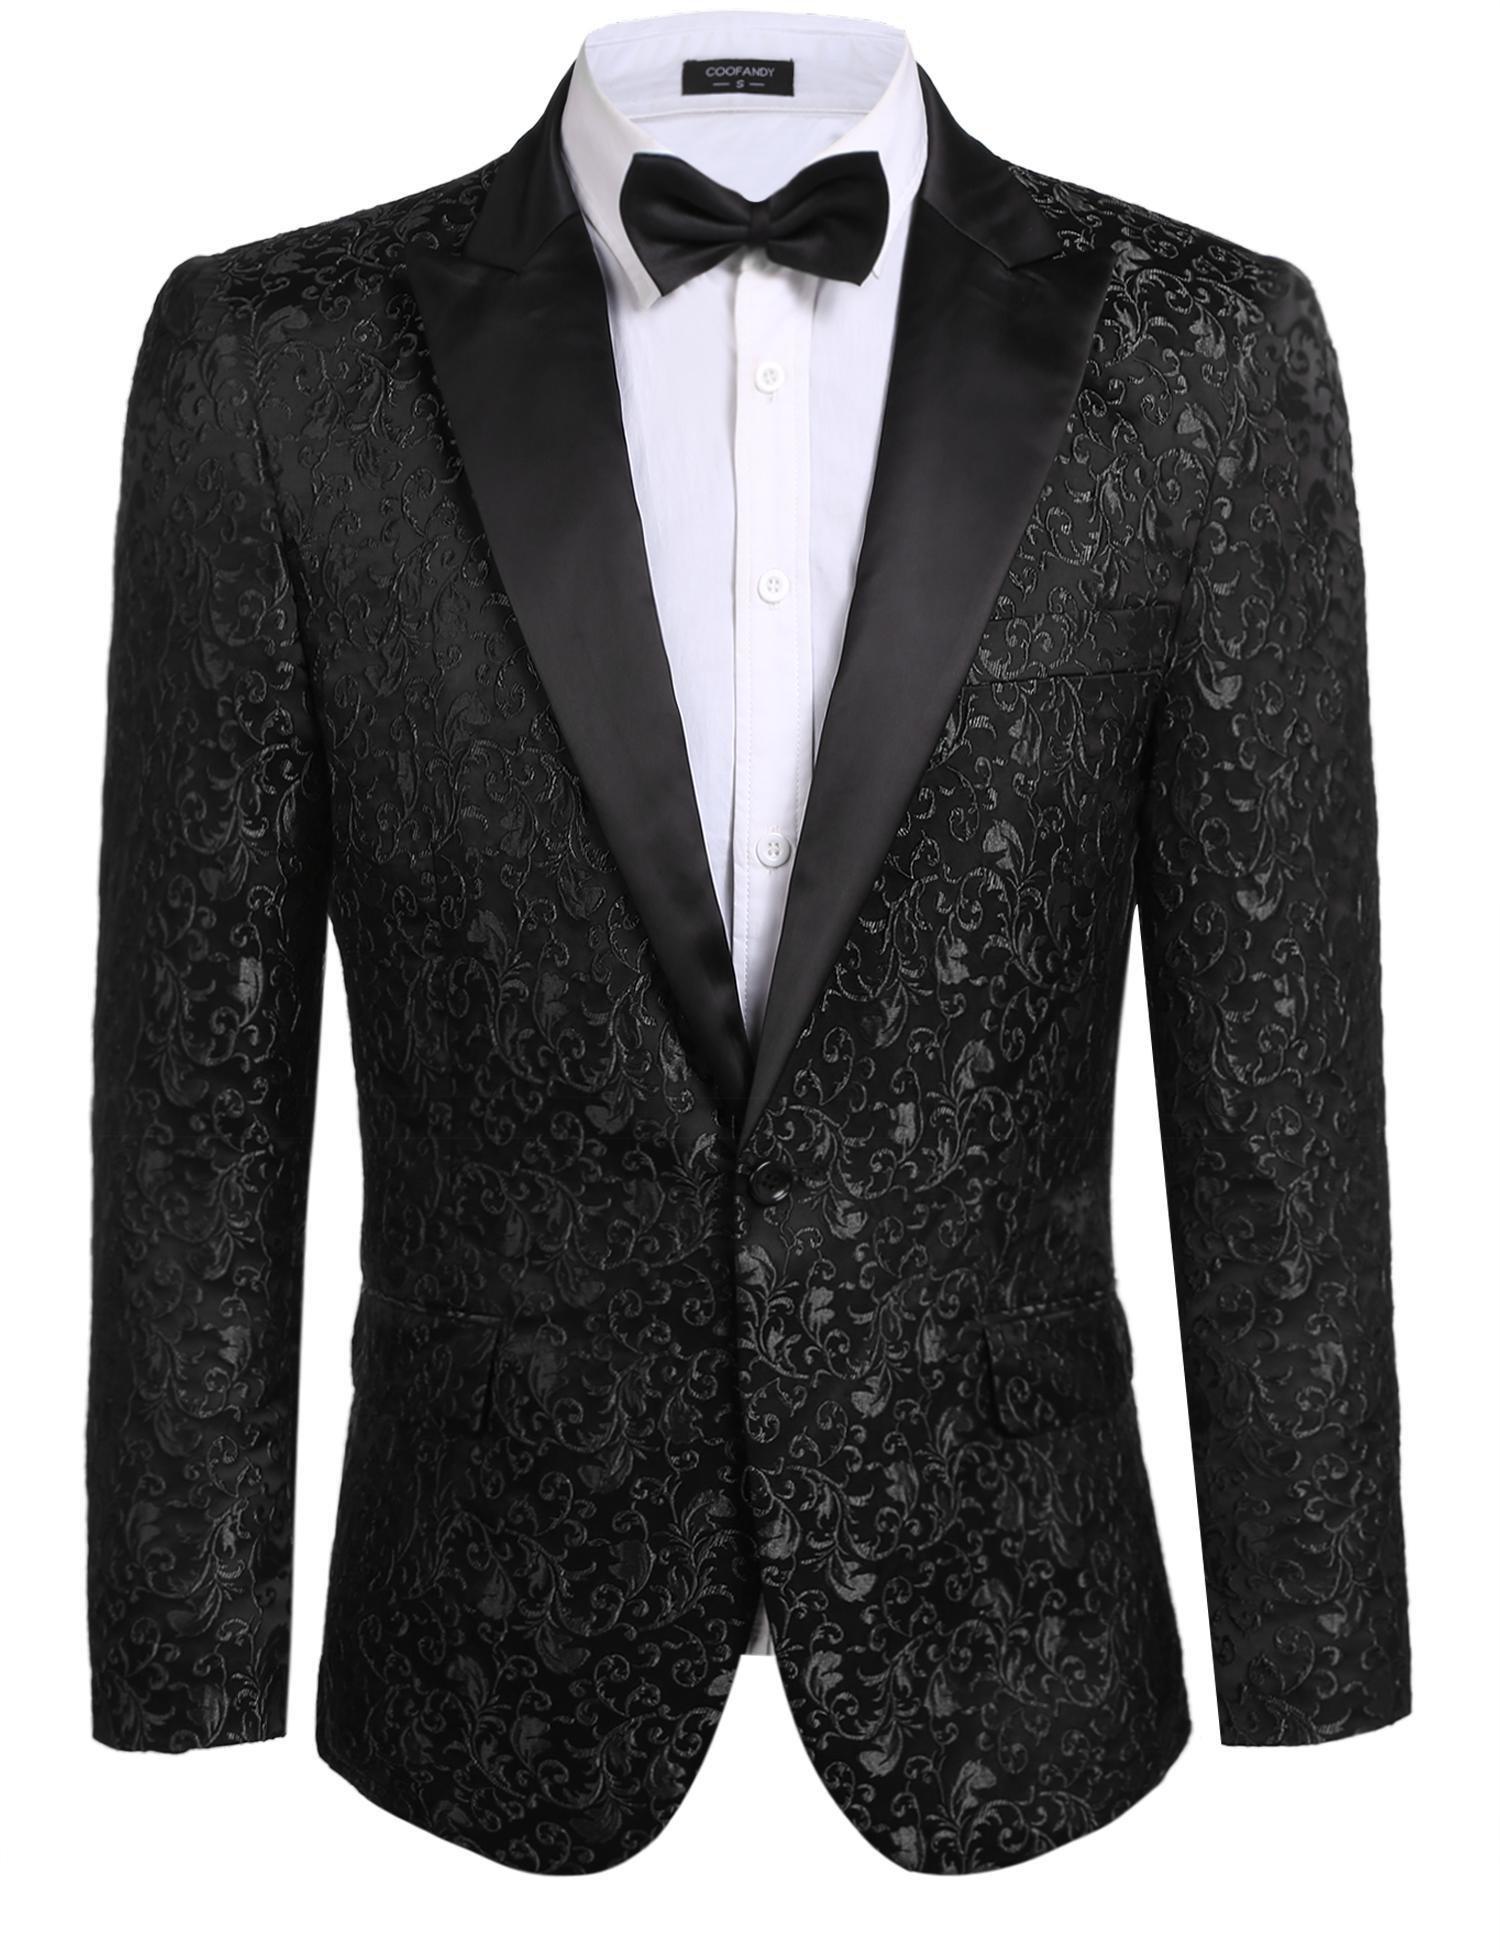 JINIDU Men's Floral Party Dress Suit Stylish Dinner Jacket Wedding Blazer Prom Tuxedo